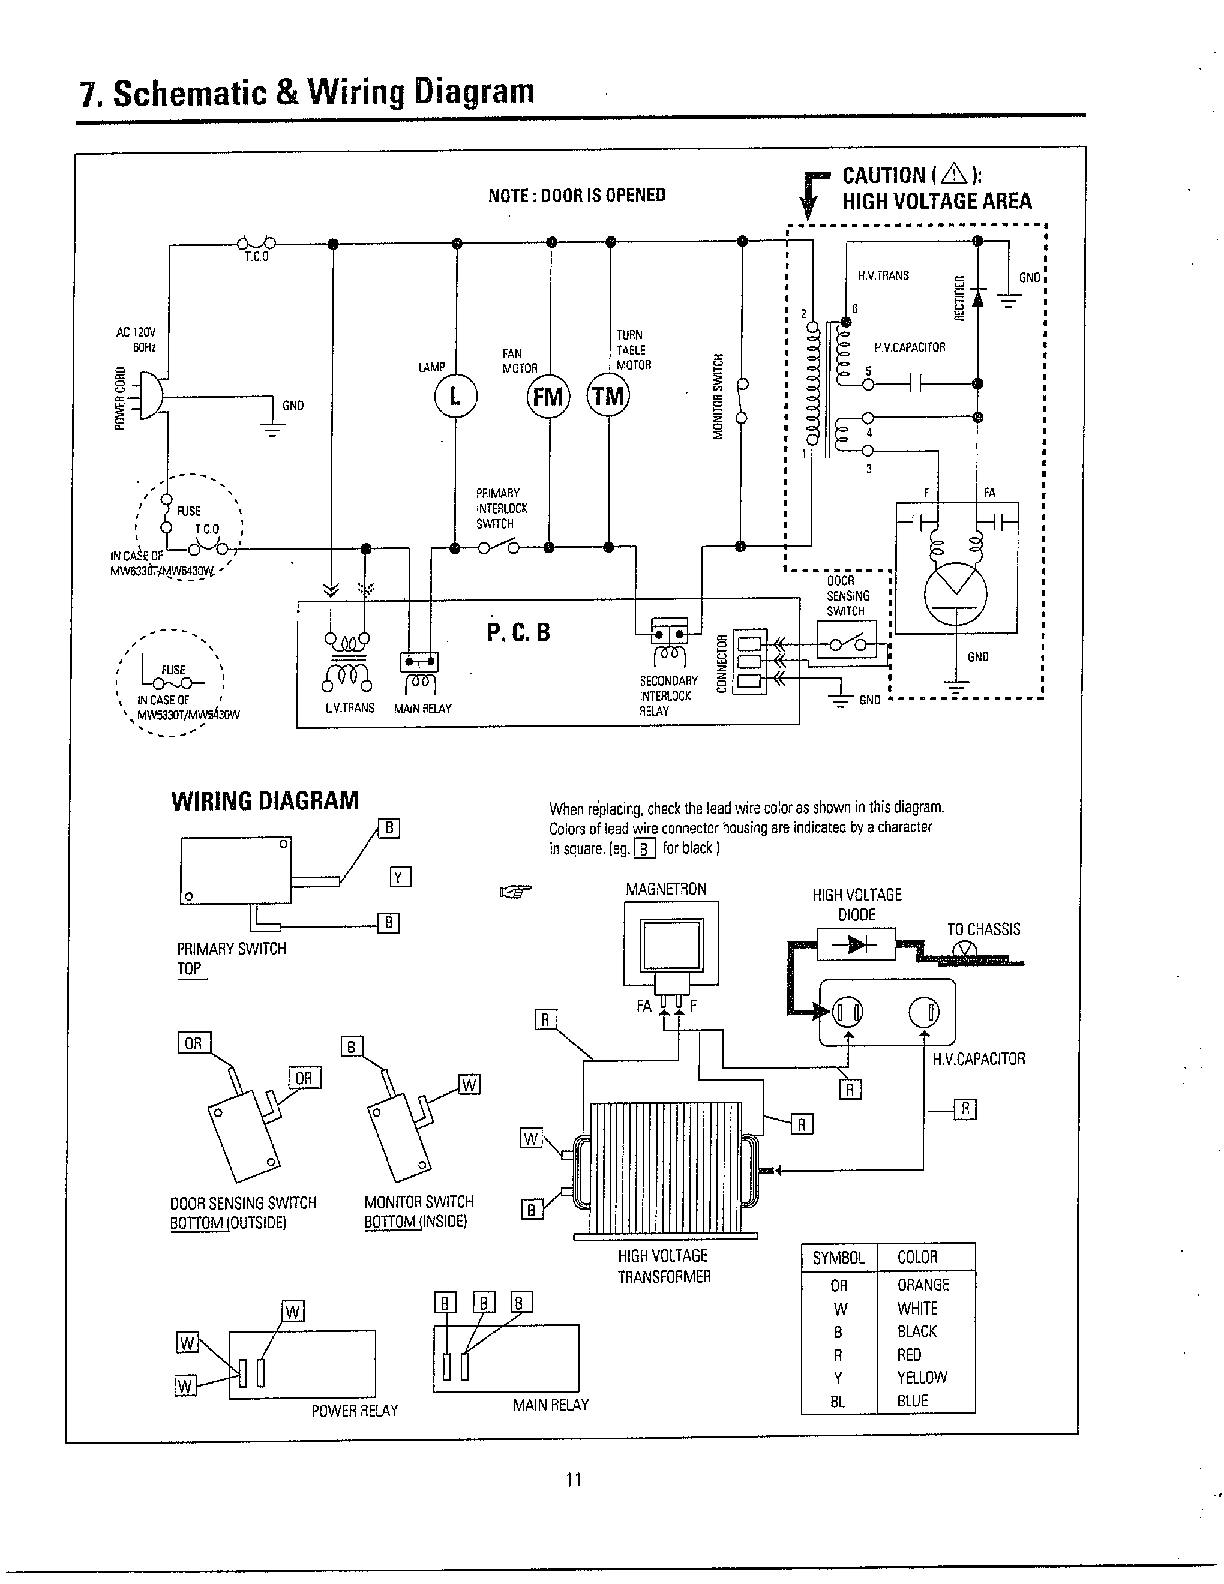 ge oven schematic diagram 220 house wiring لدى ميكرويف ماركة كينوود الحرارة لا تعمل - منتدى القرية الإلكترونية